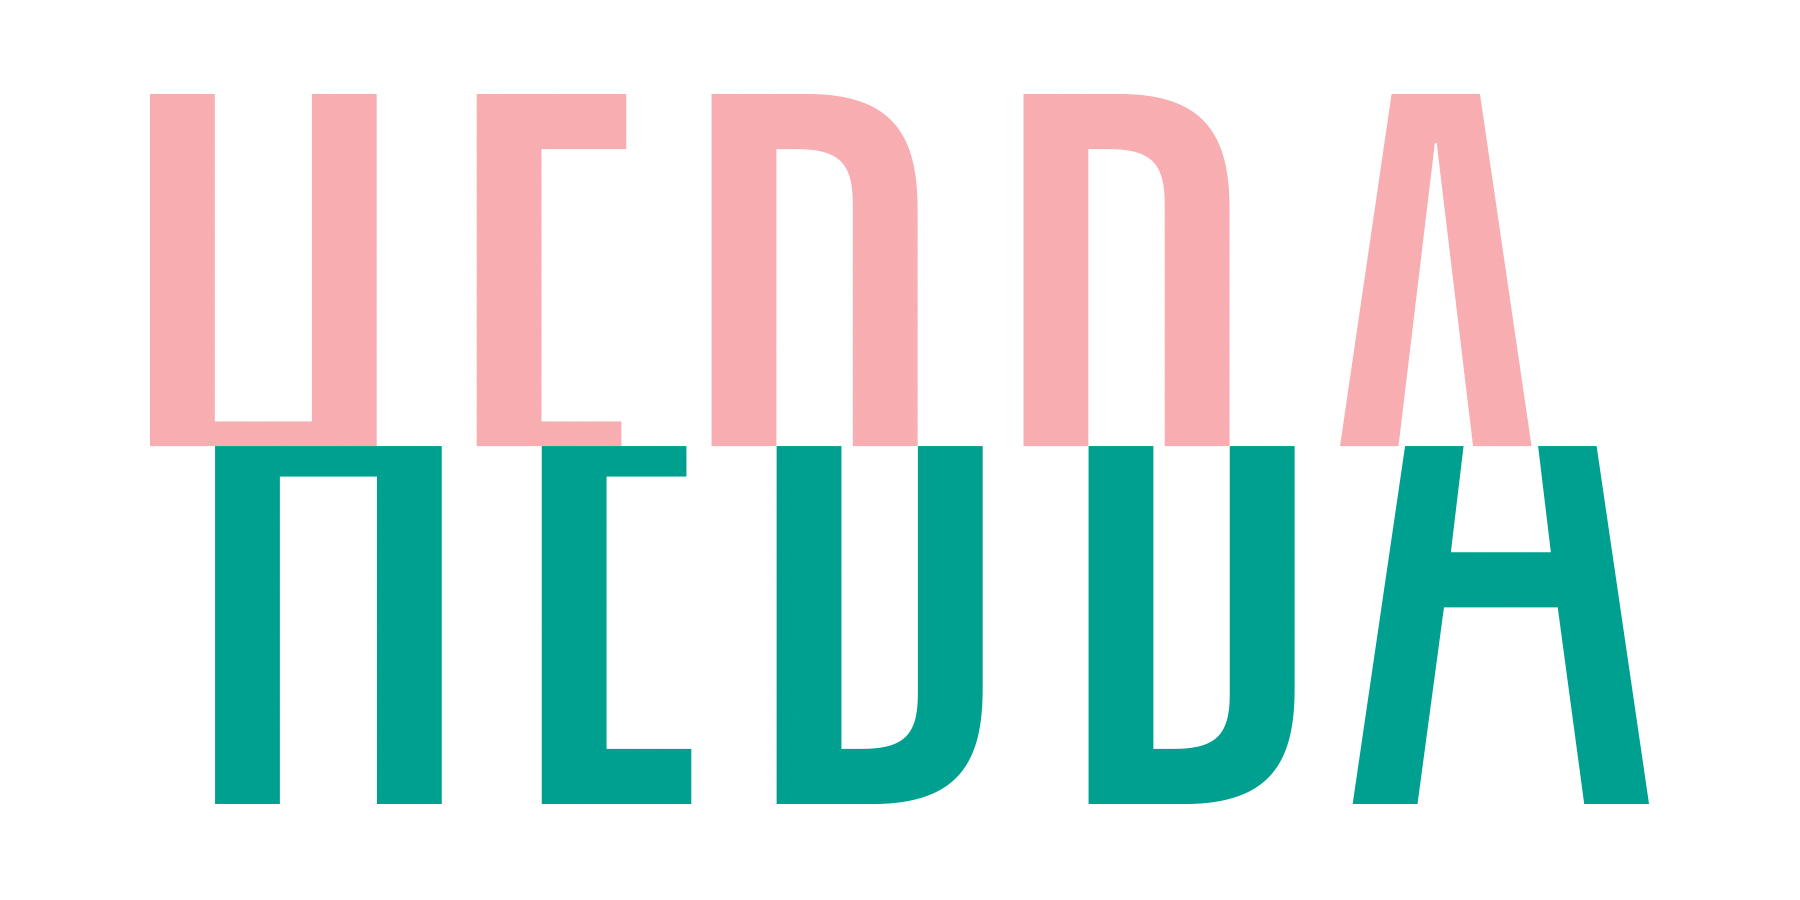 Hedda-logo_farger.jpg